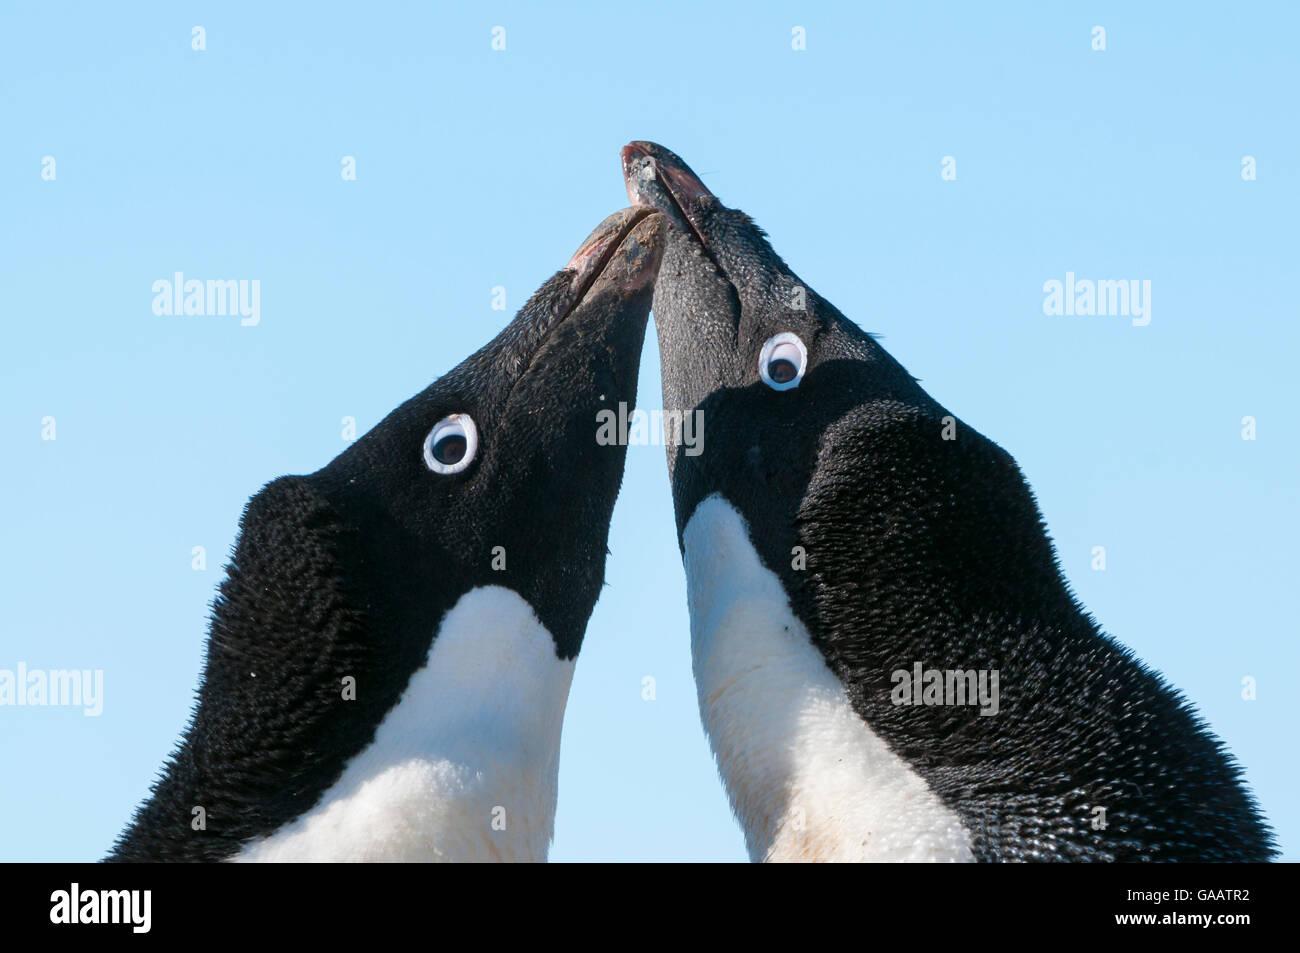 Adelie penguin (Pygoscelis adeliae) courtship behaviour. Prydz Bay, near Davis Station, Vestfold Hills, Ingrid Christensen - Stock Image